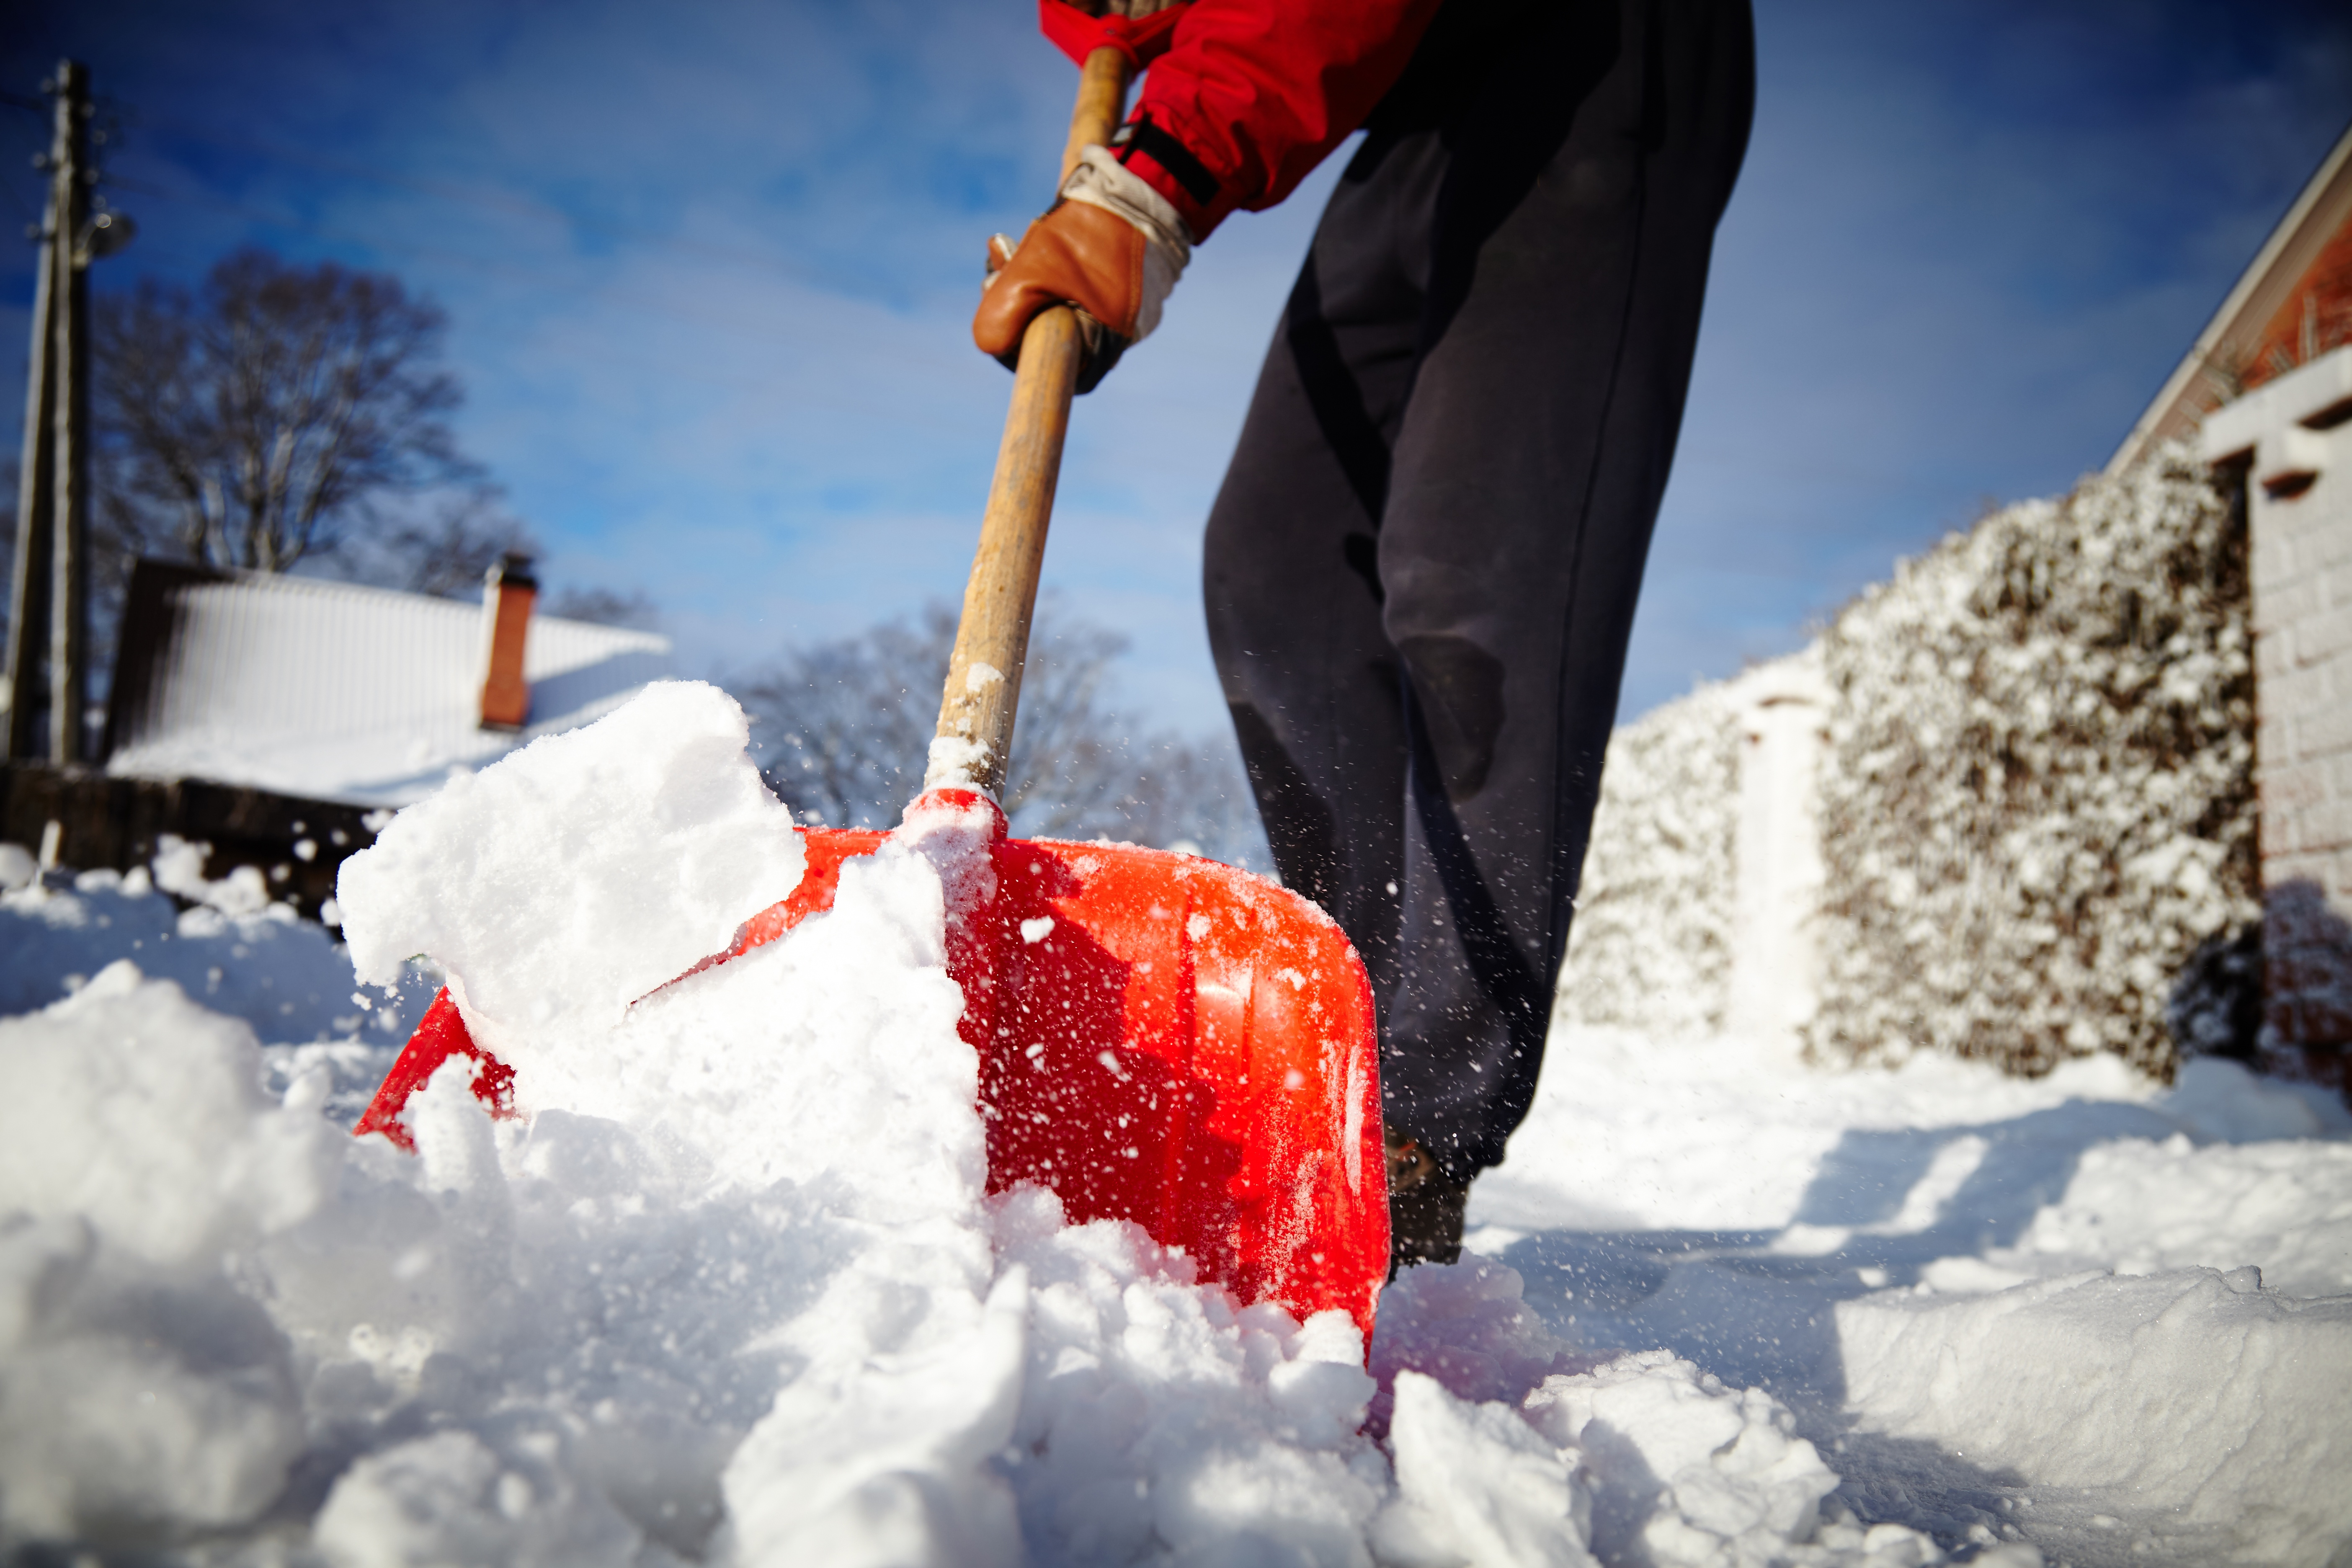 Shoveling Snow Image